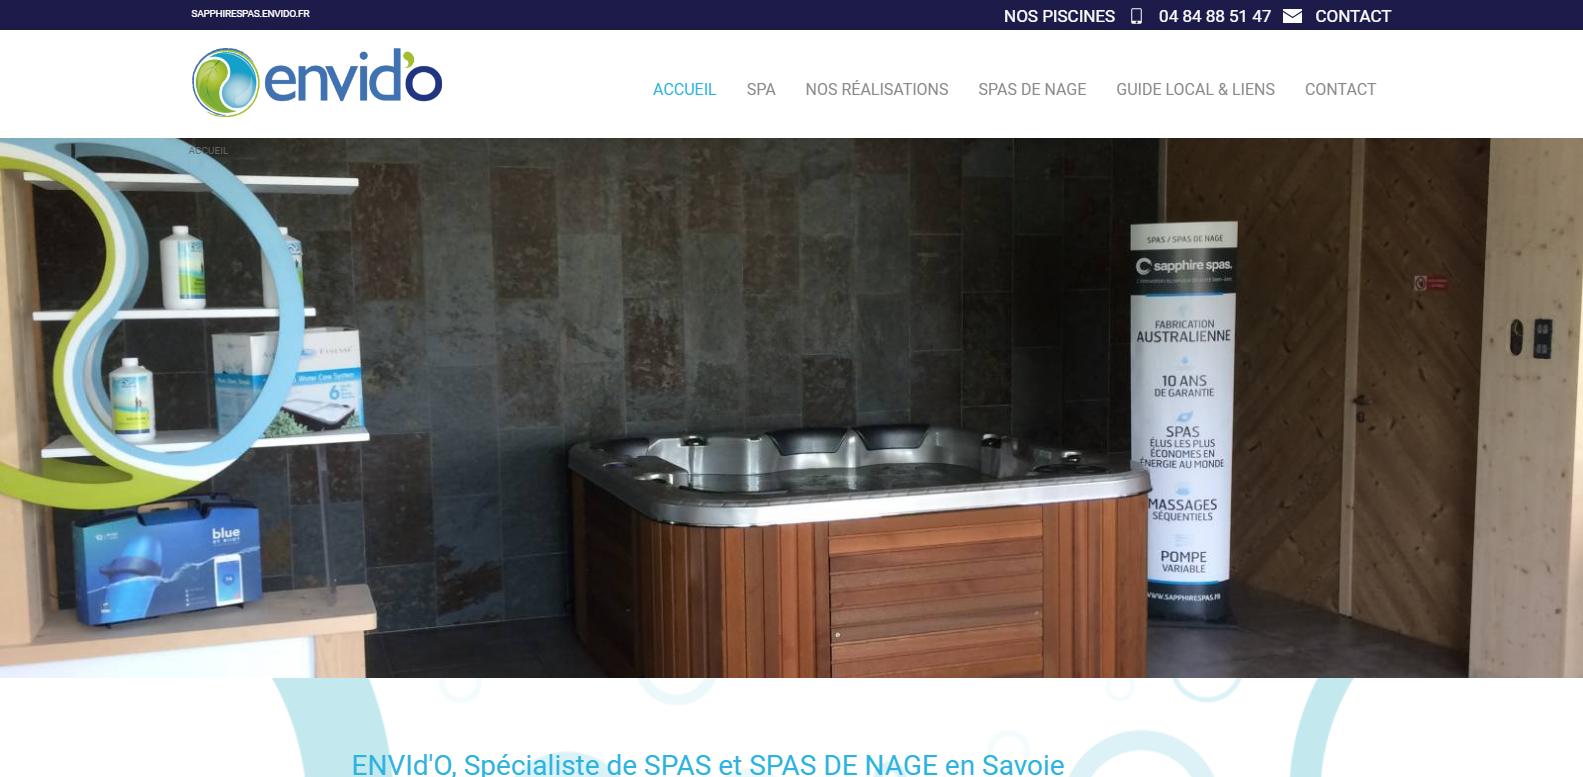 Vente de spa haut de gamme en Savoie